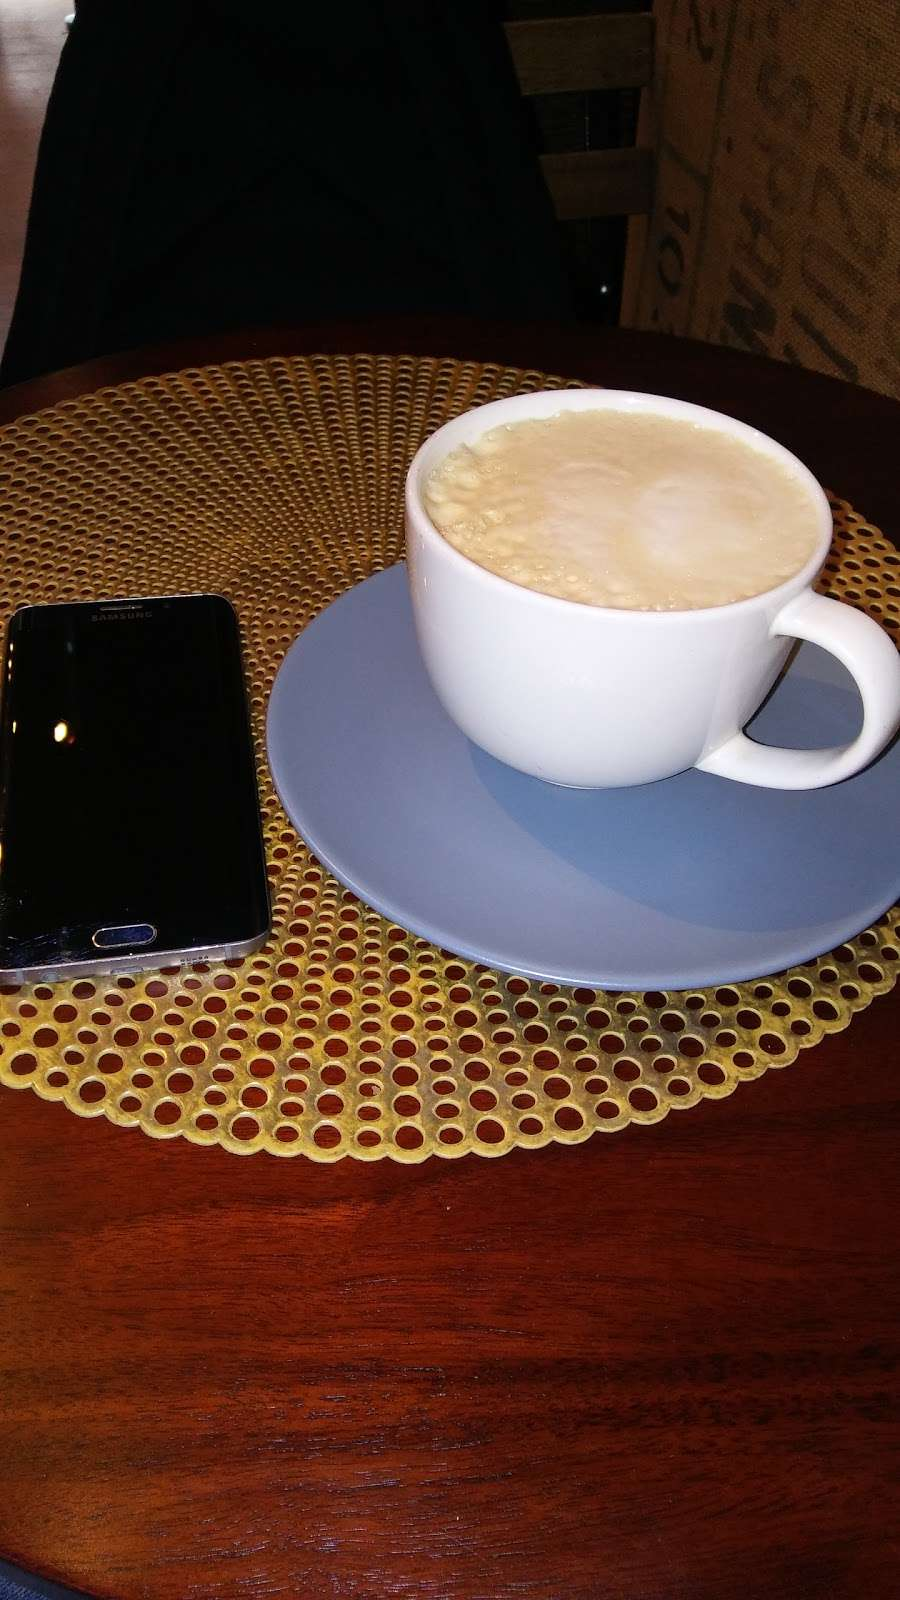 Blue Cups - cafe  | Photo 7 of 10 | Address: 38-4 61st St, Woodside, NY 11377, USA | Phone: (917) 832-6940